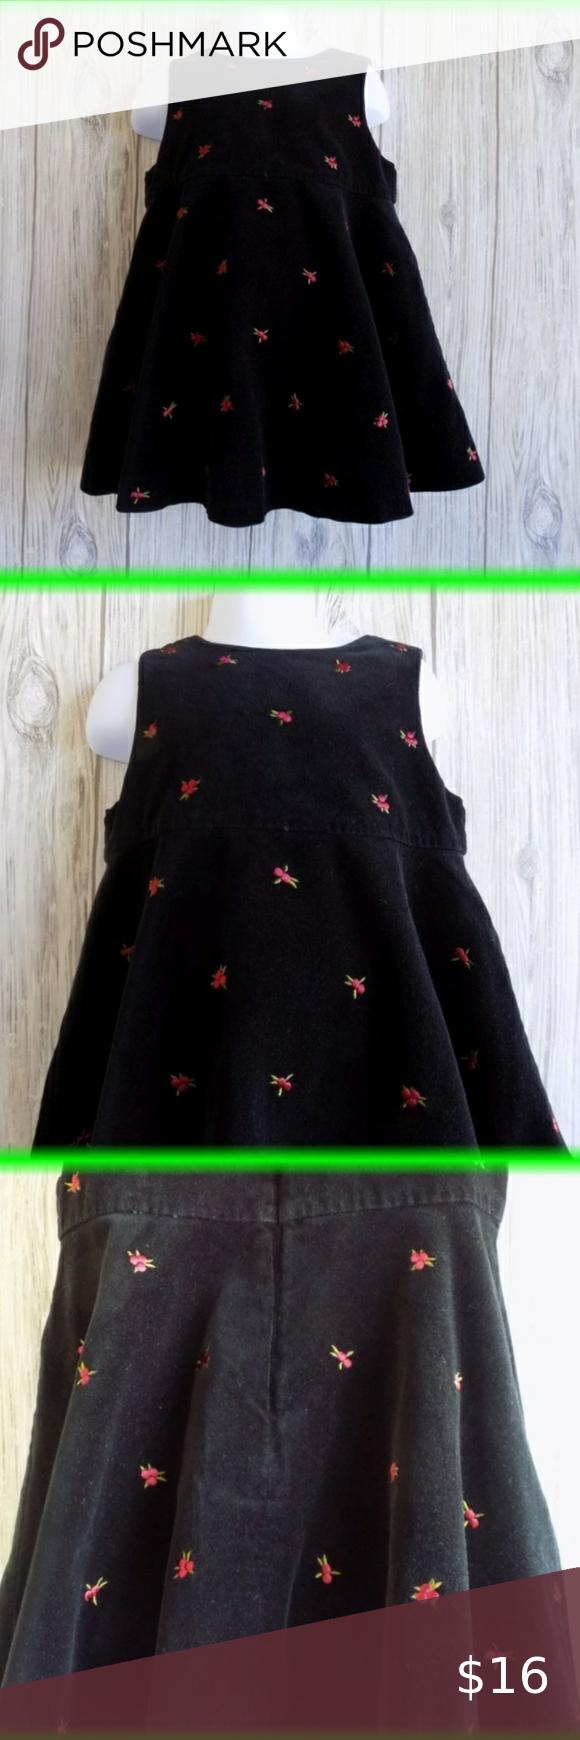 Gymboree Holiday Jumper Velvet Dress Size 2t Velvet Dress Gymboree Dresses Size Girls [ 1740 x 580 Pixel ]